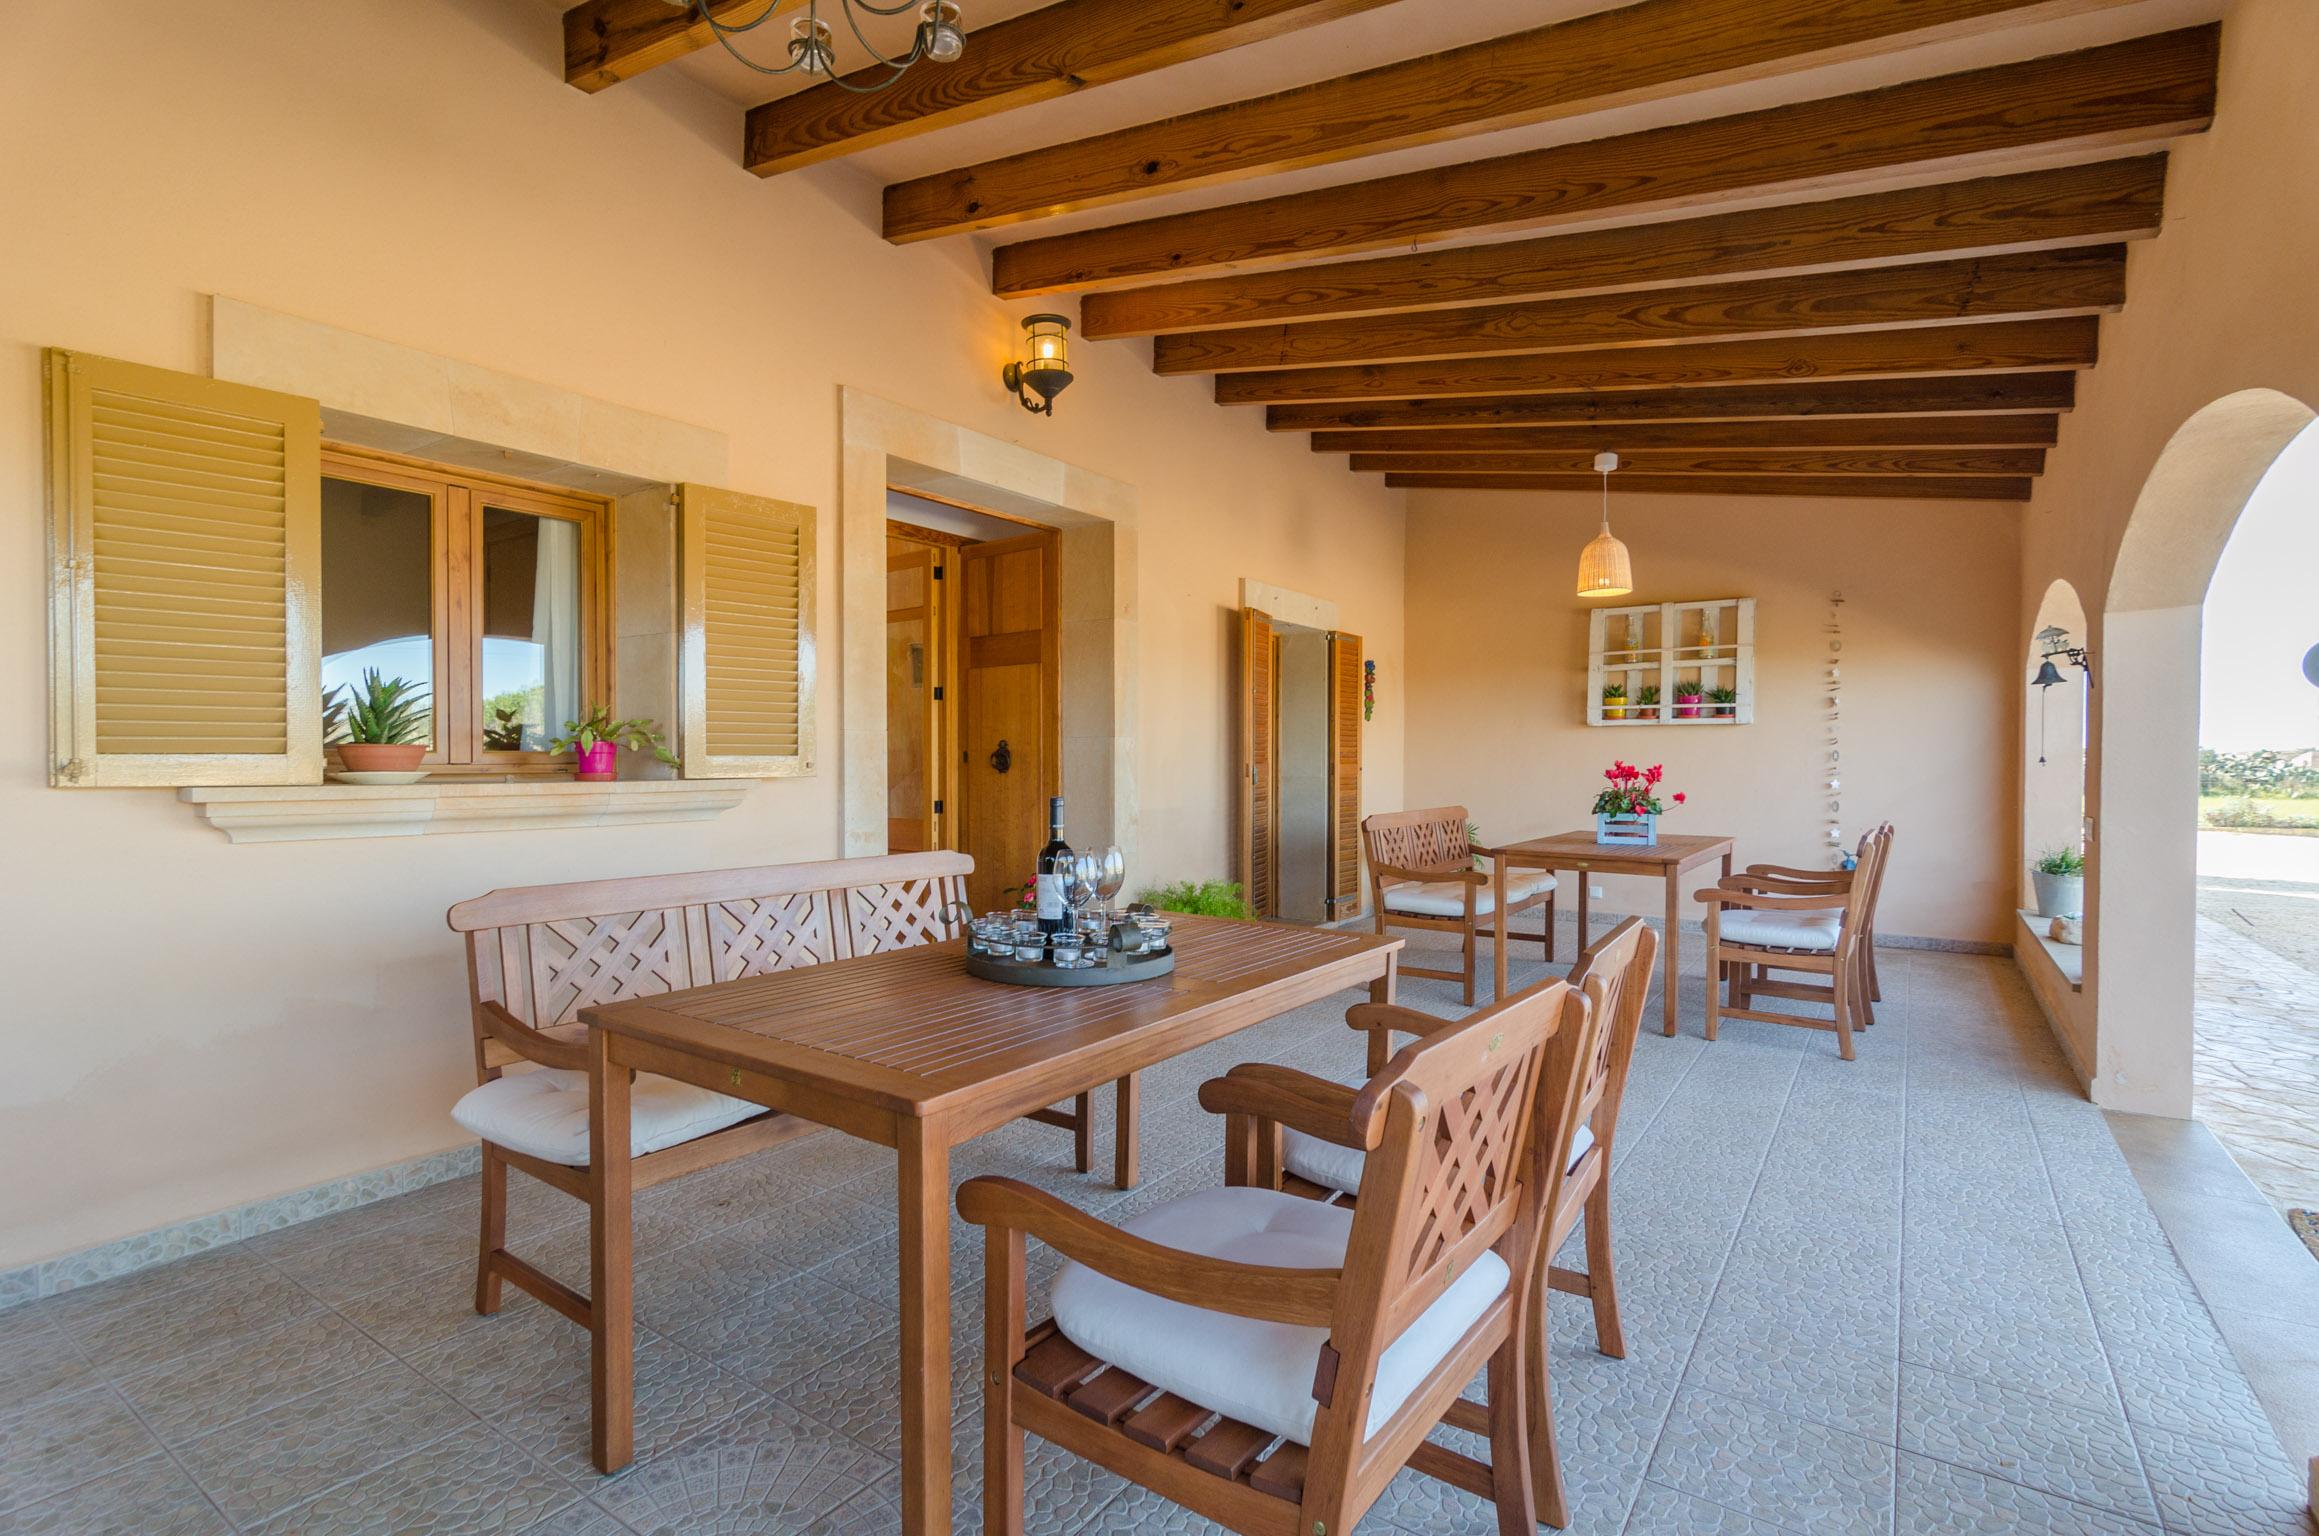 Ferienhaus SANT BLAI VELL (2284789), Campos, Mallorca, Balearische Inseln, Spanien, Bild 9